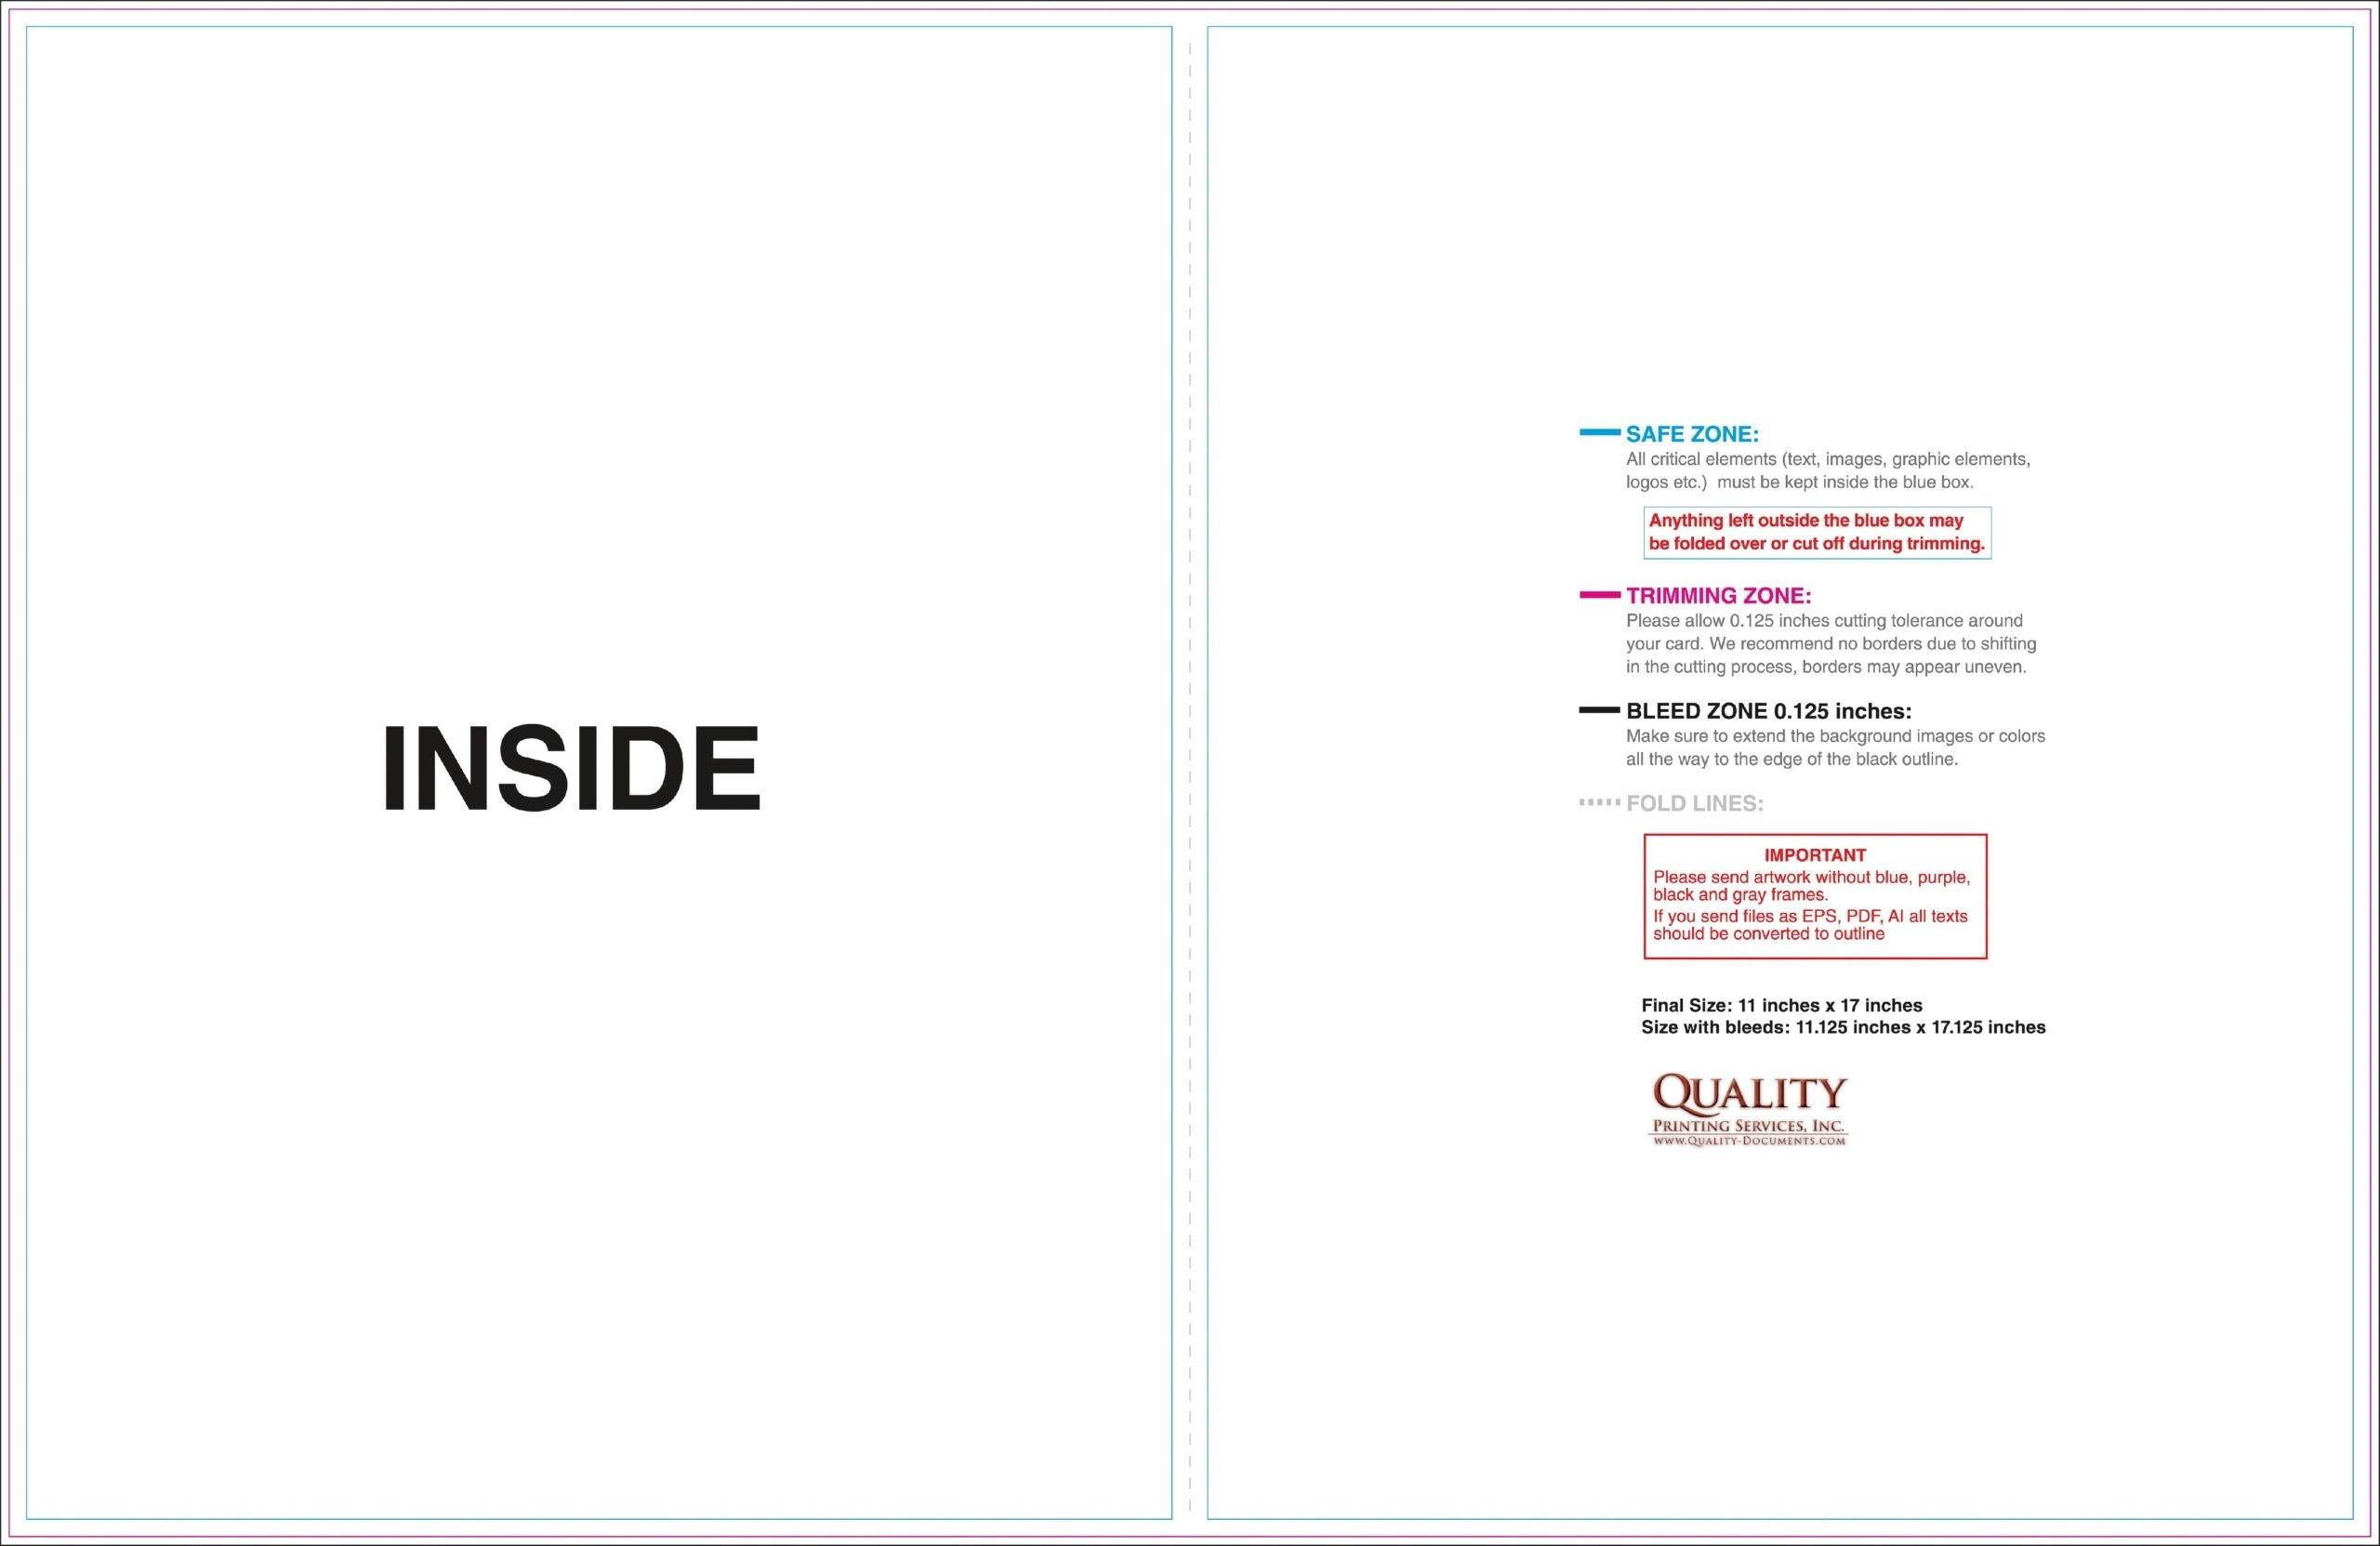 11×17 Half Fold Brochure Template Jparryhill - Carlynstudio regarding 11X17 Brochure Template